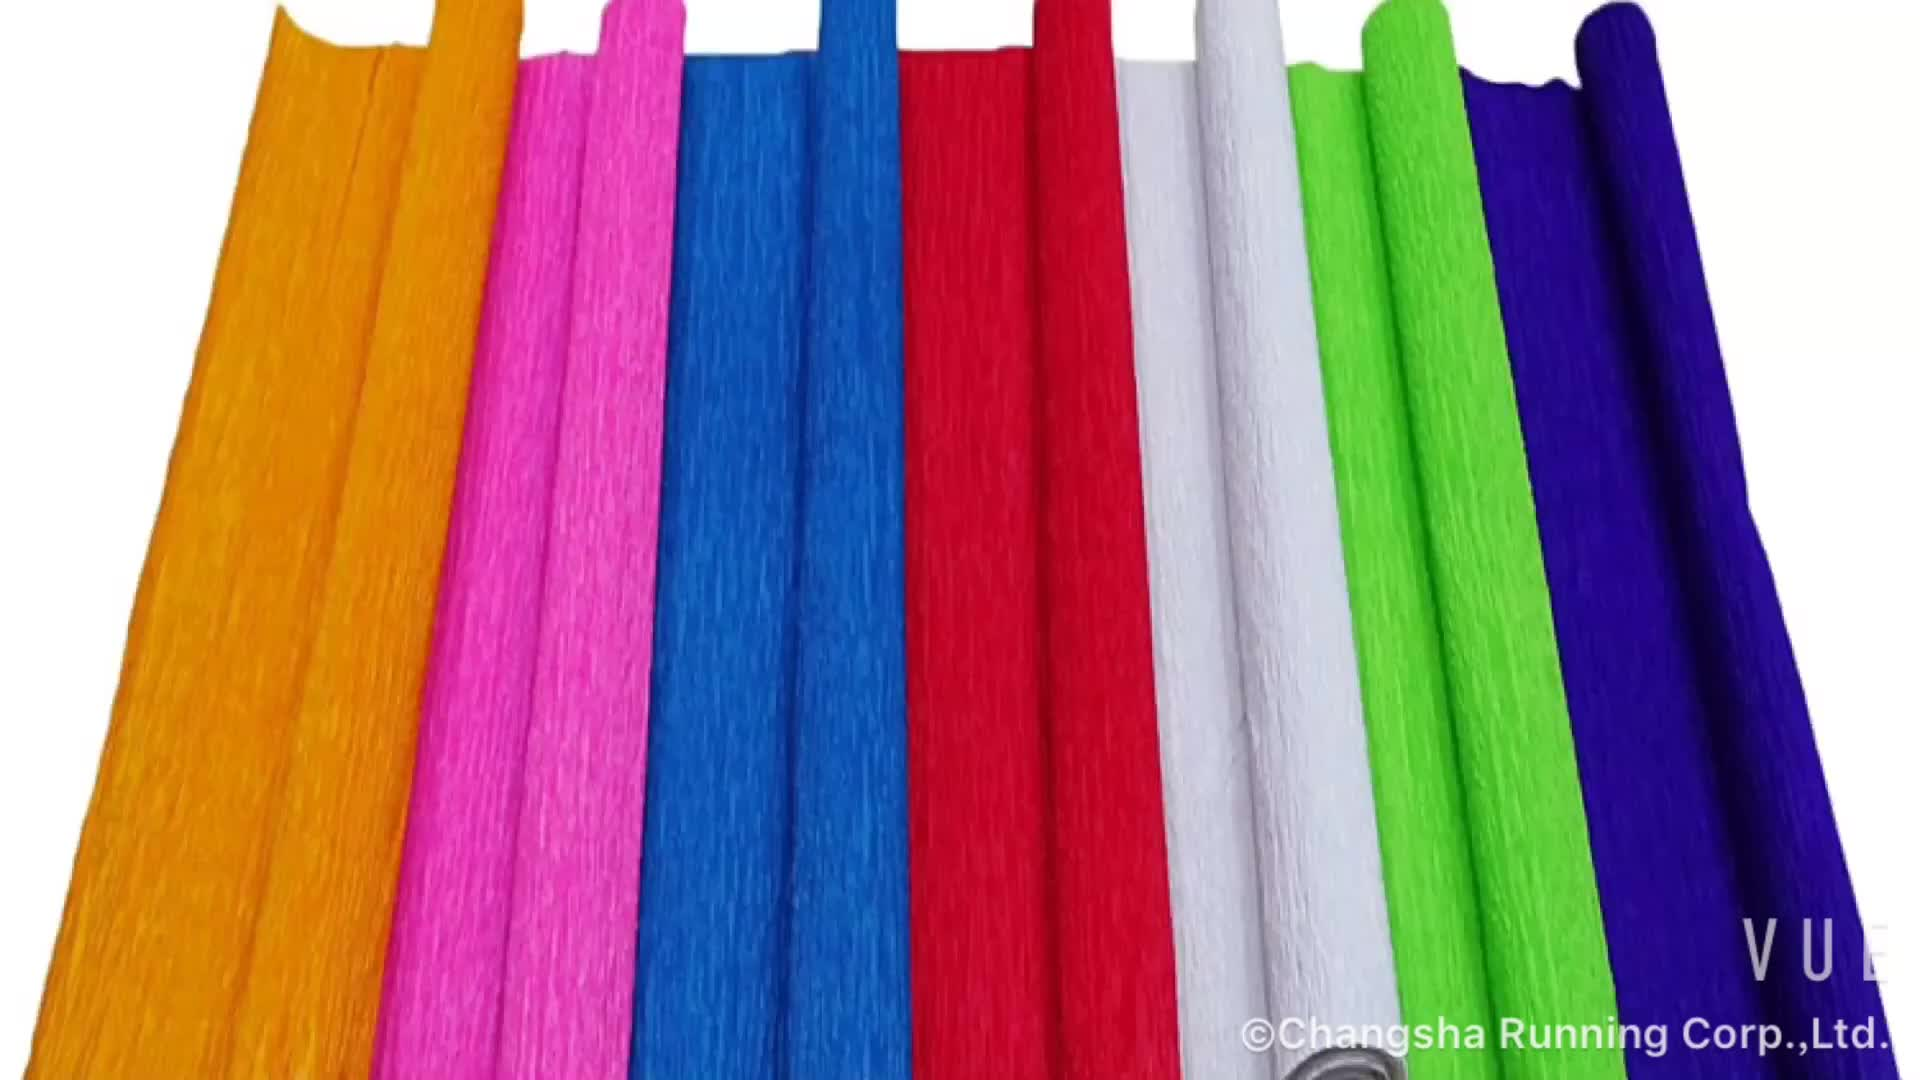 Высокое качество креп рулона бумаги с 8ft длина 20in ширина